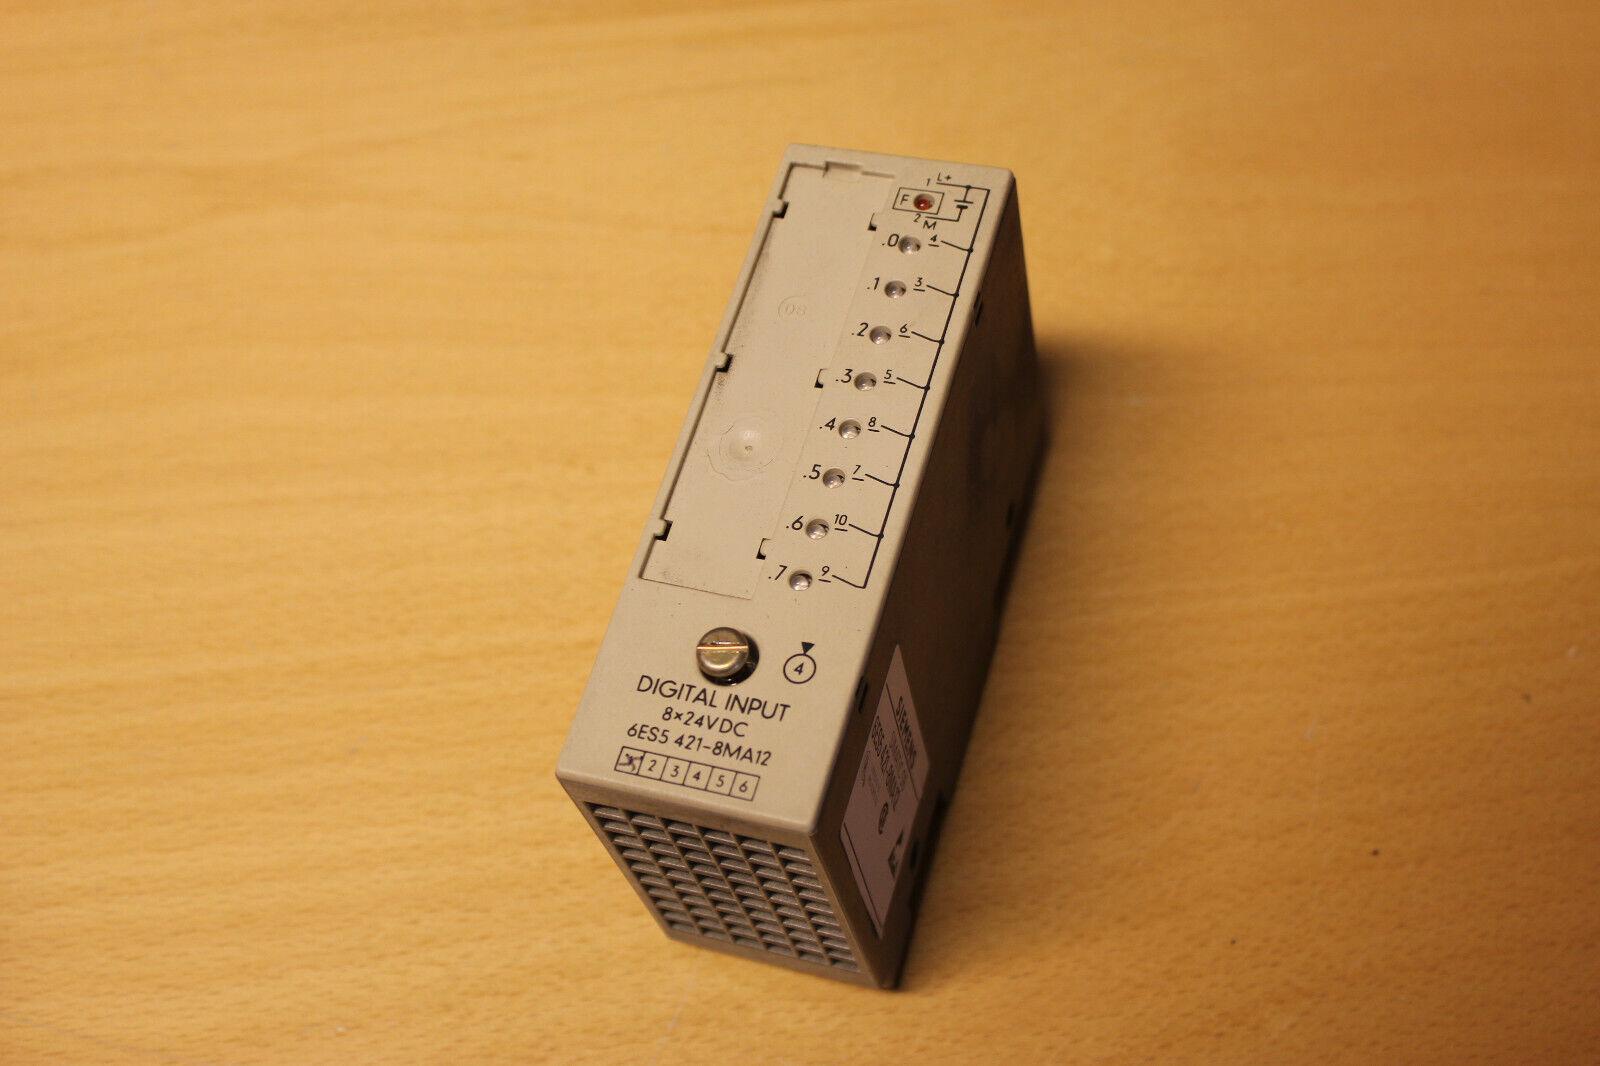 Siemens Simatic S5 6ES5 421-8MA12 - Digital Input 8x24V DC PLC - EXPRESS SHIPPIN